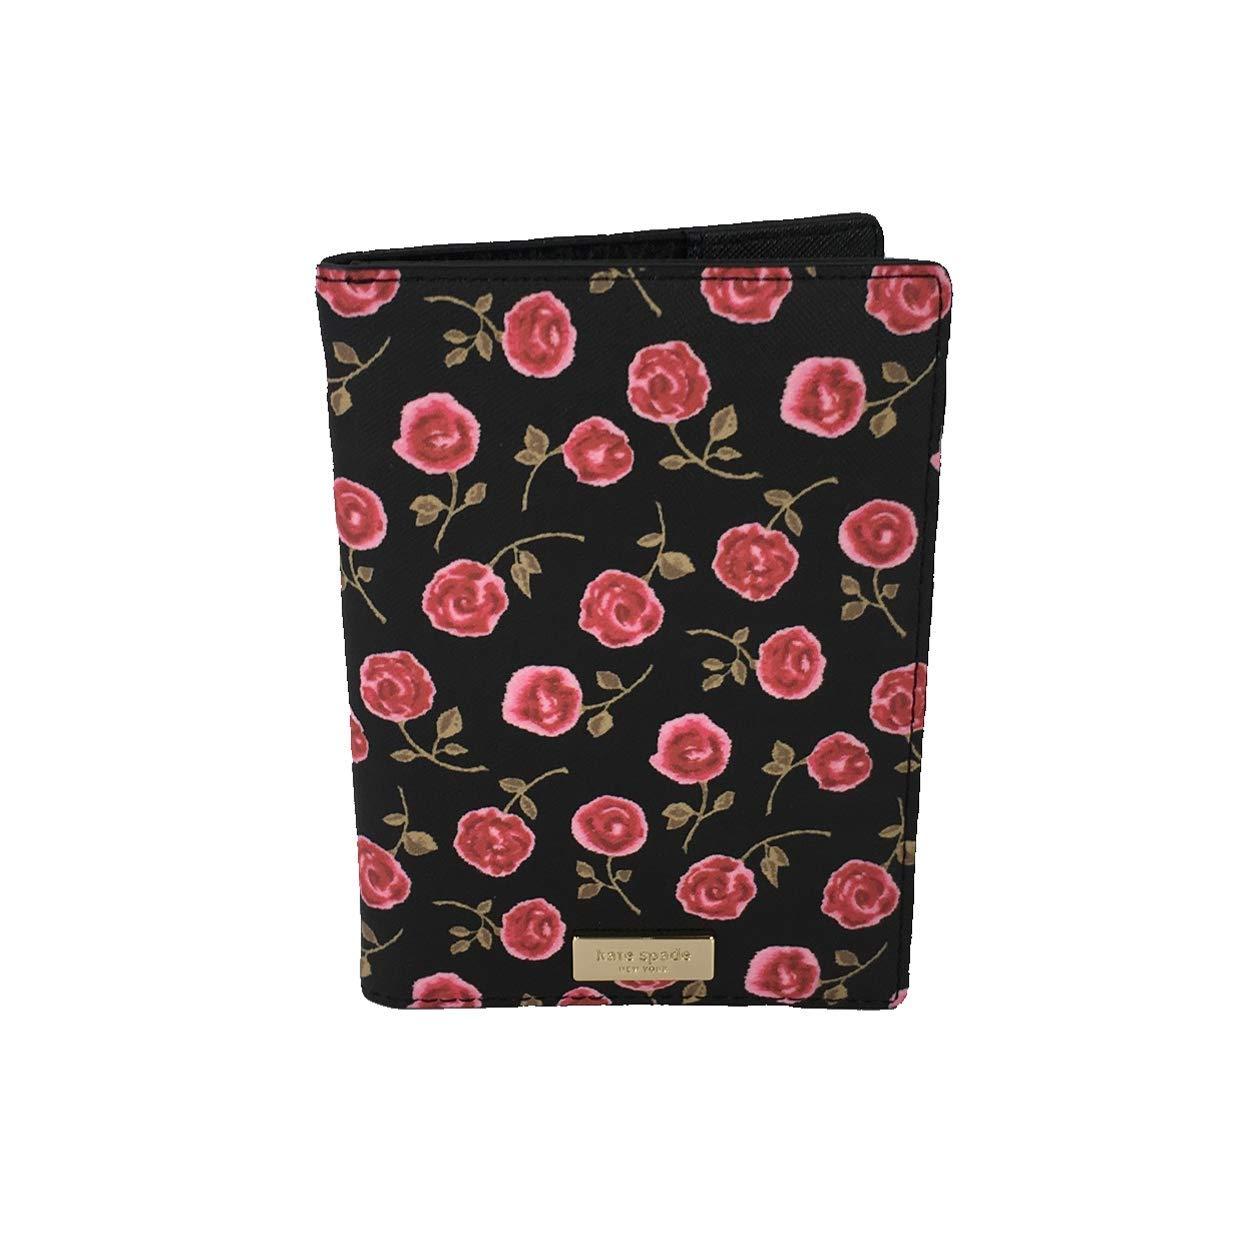 Kate Spade Hazy Rose Imogene Passport Holder, Black (Rose printed) by Kate Spade New York